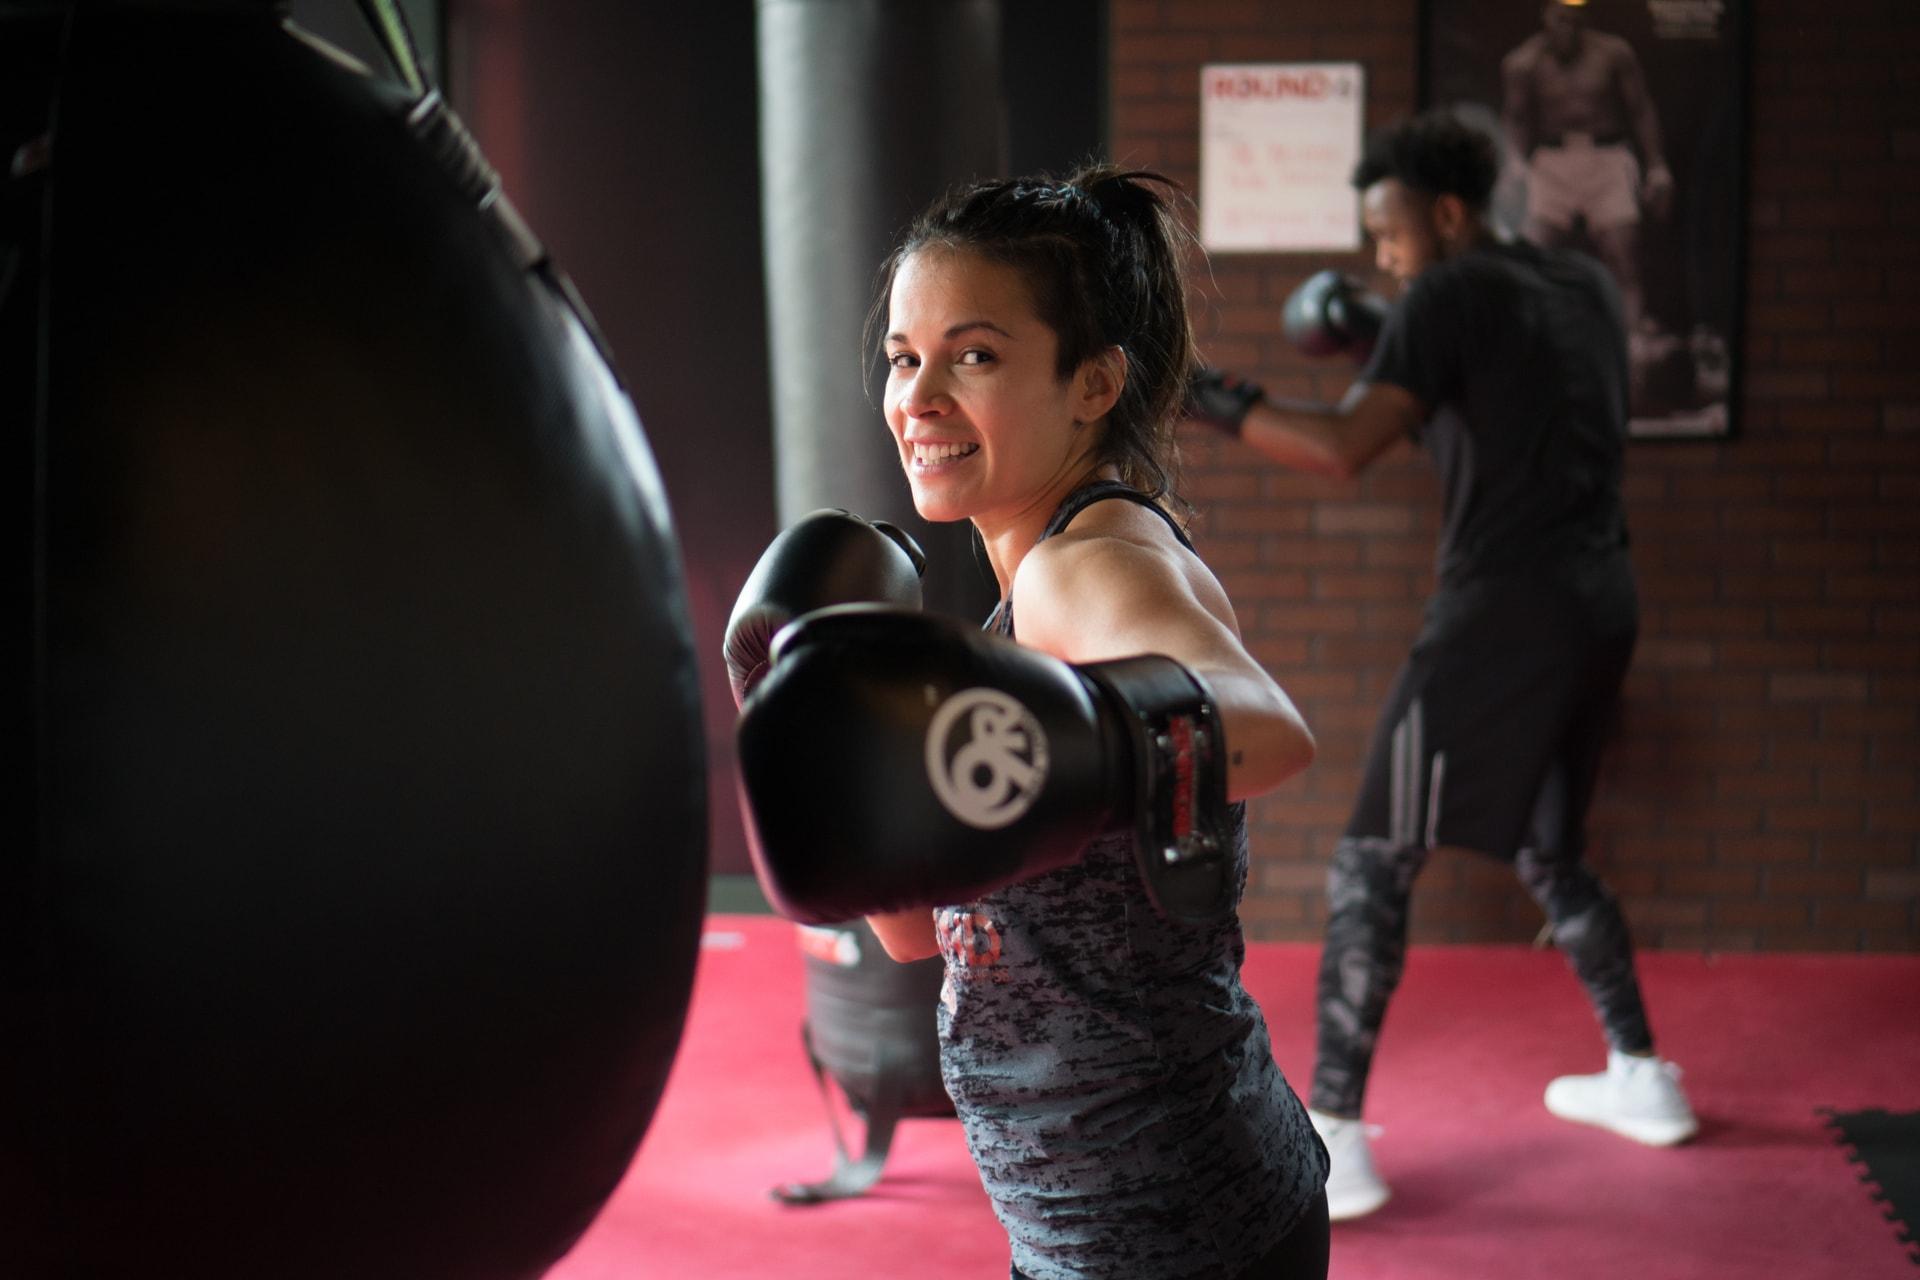 Punching bag at 9round Charlotte